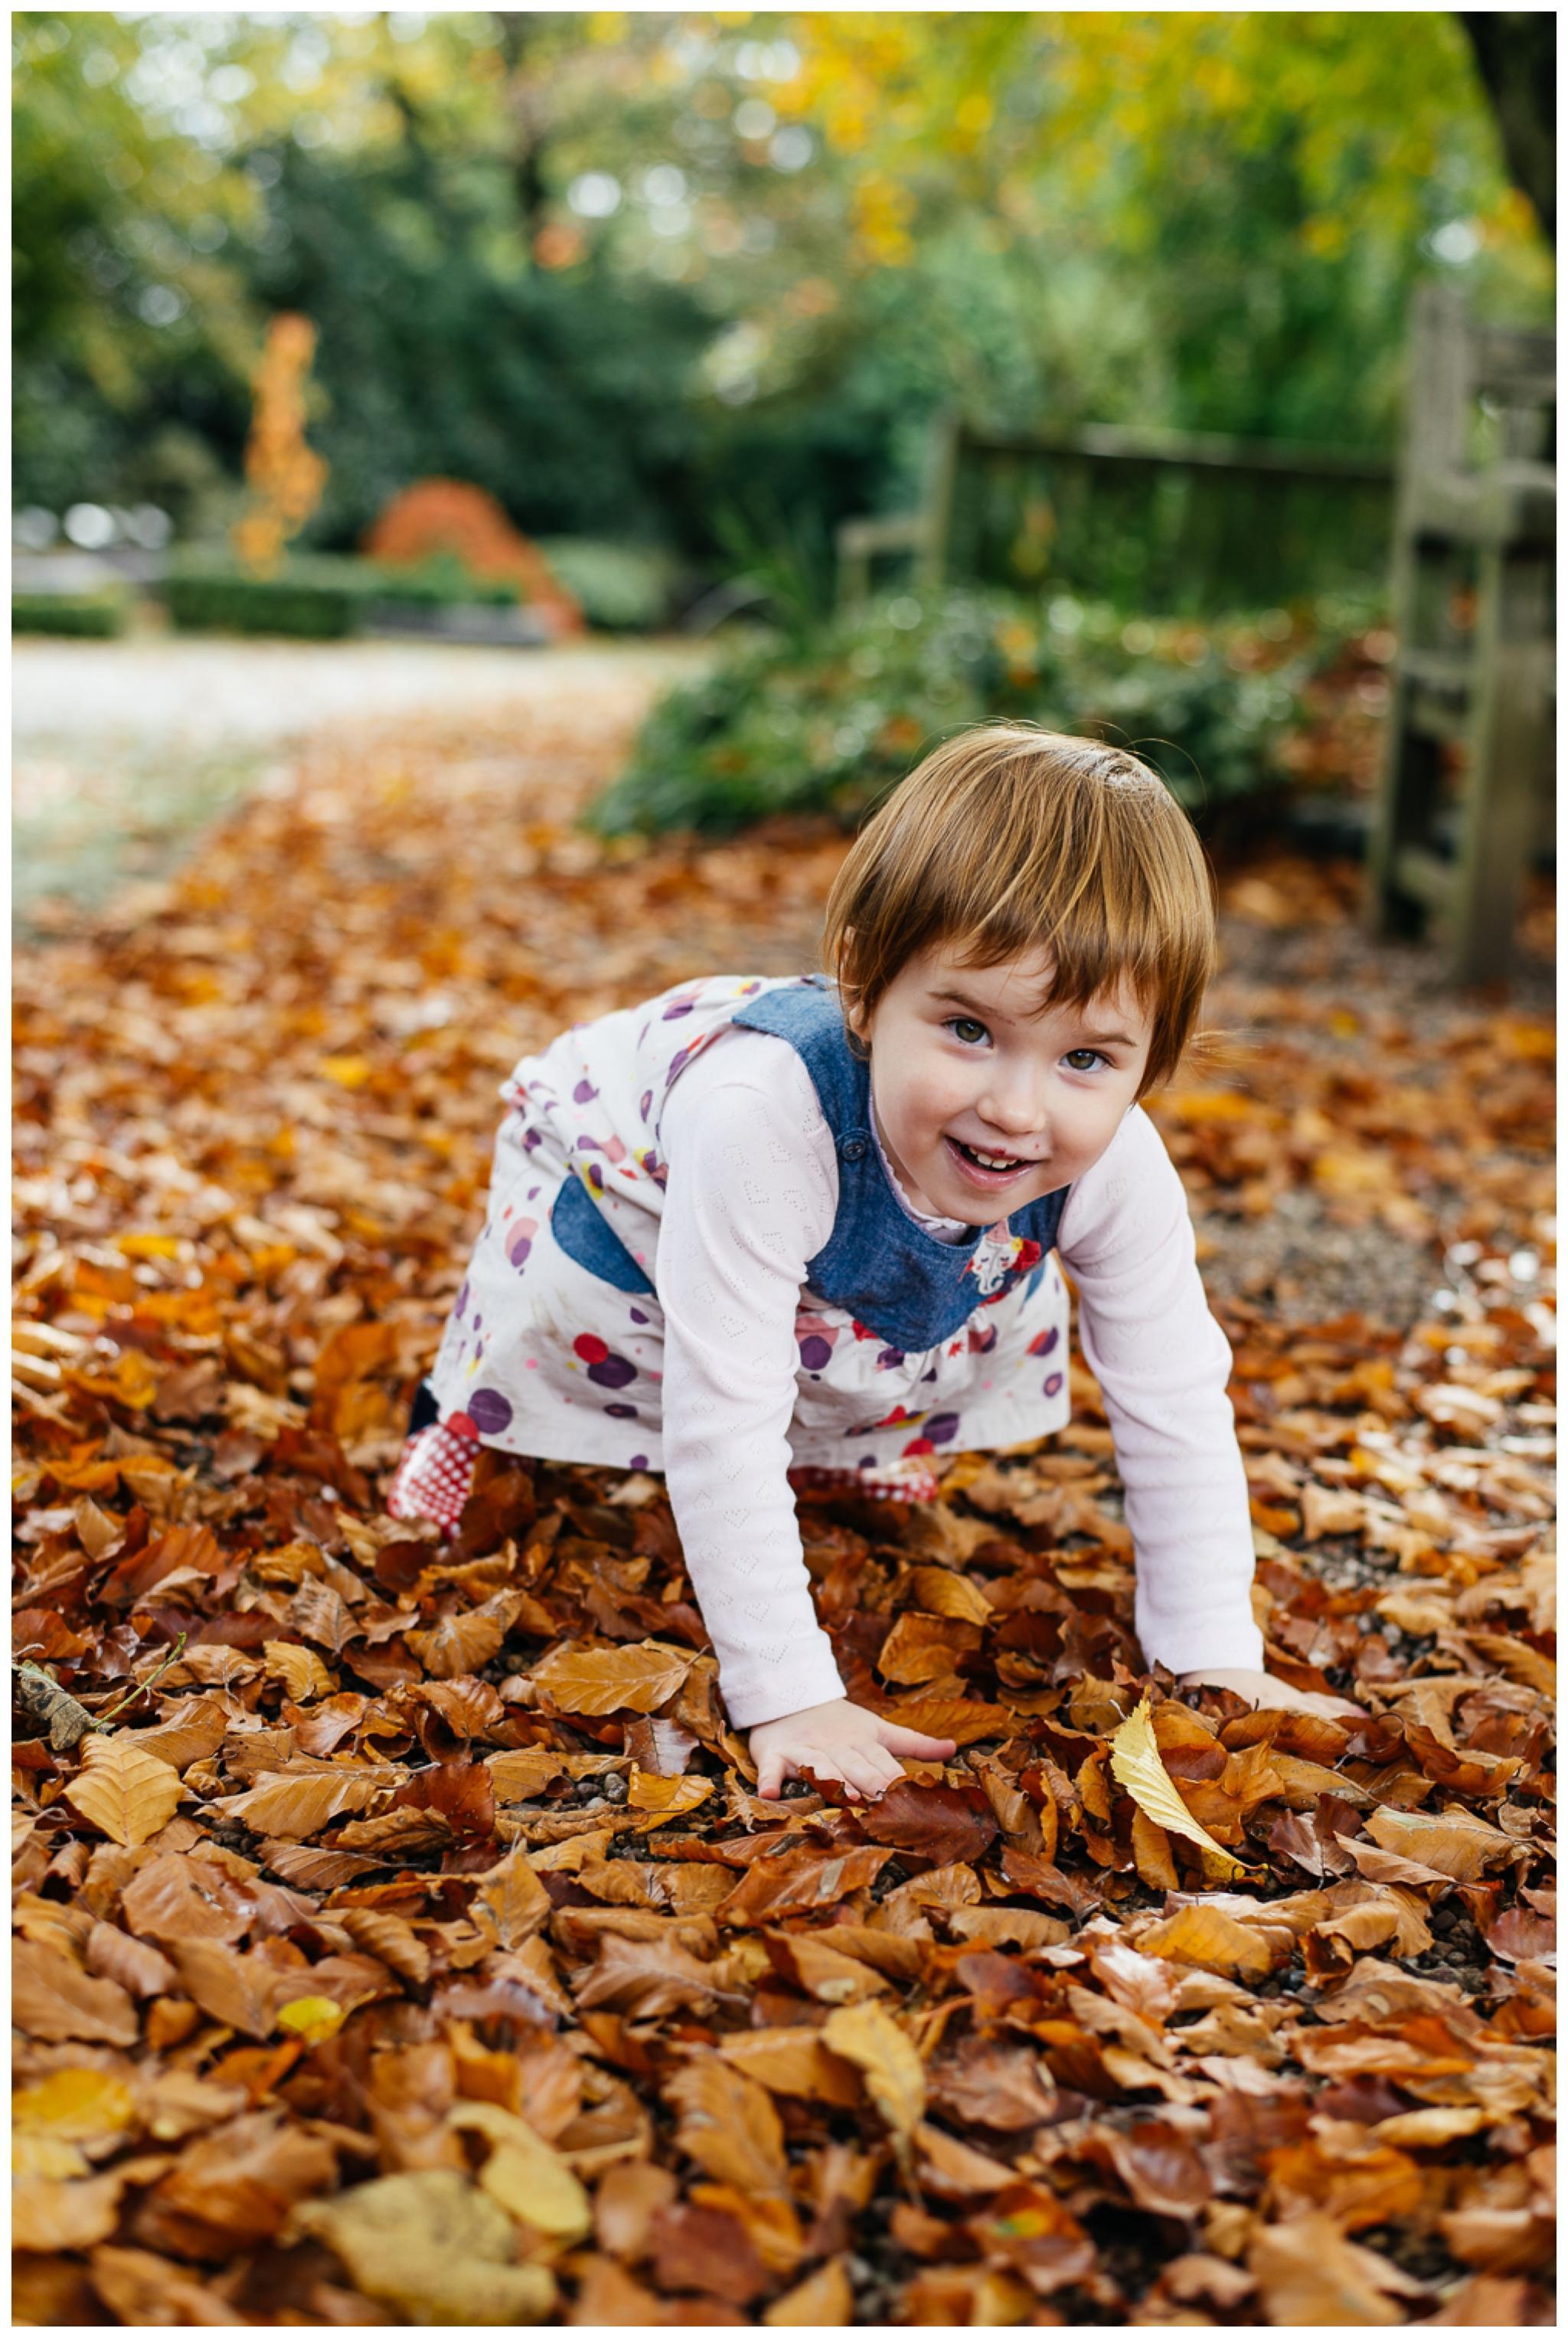 Autumn-family-portraits-birmingham-photographer_0022.jpg